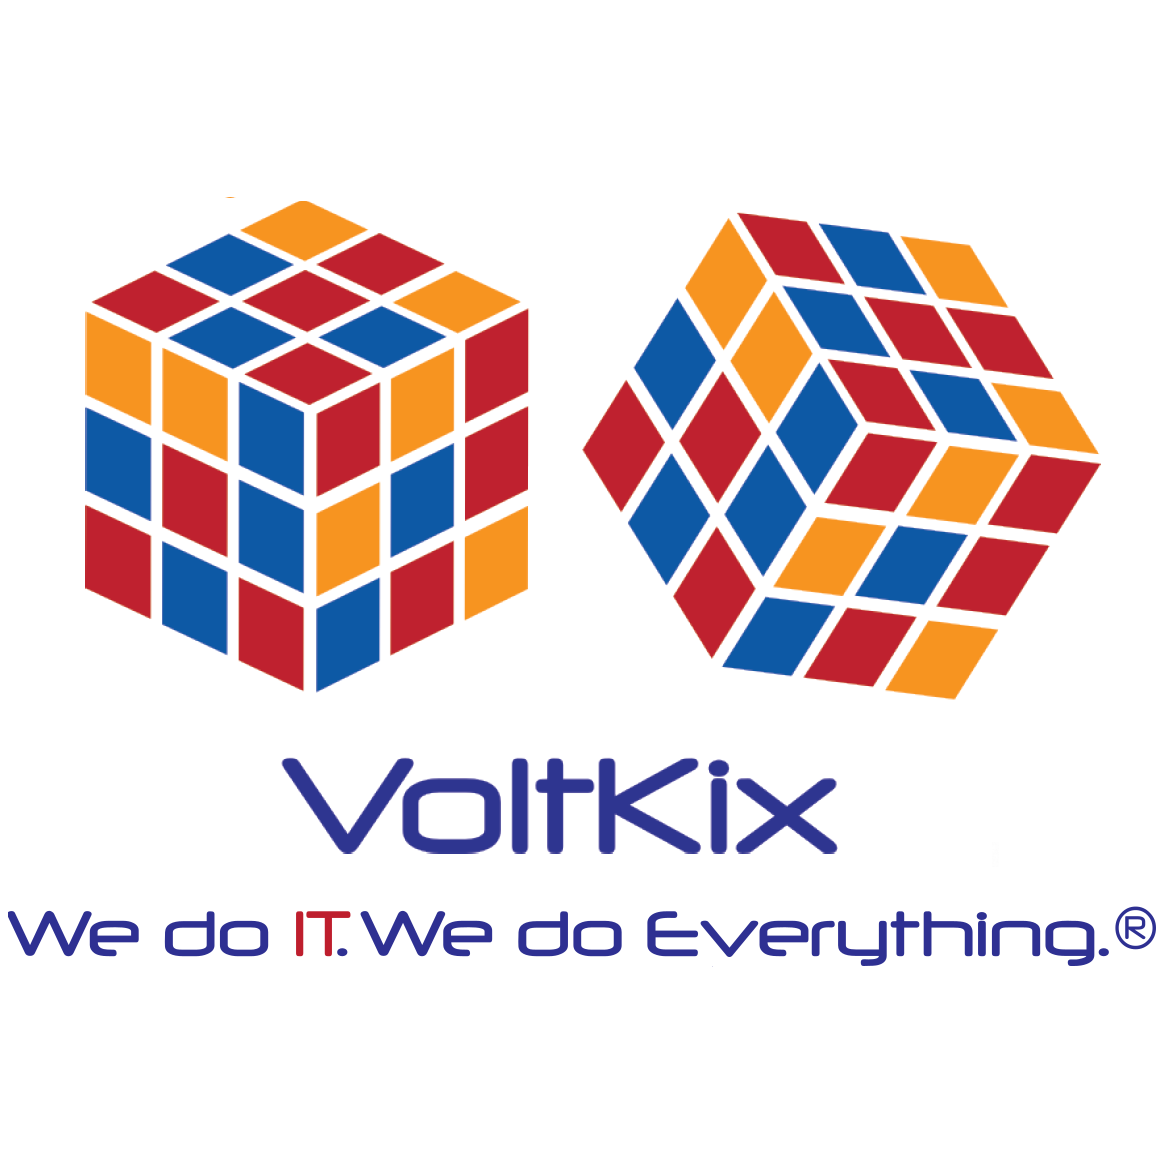 Voltkix Corporation